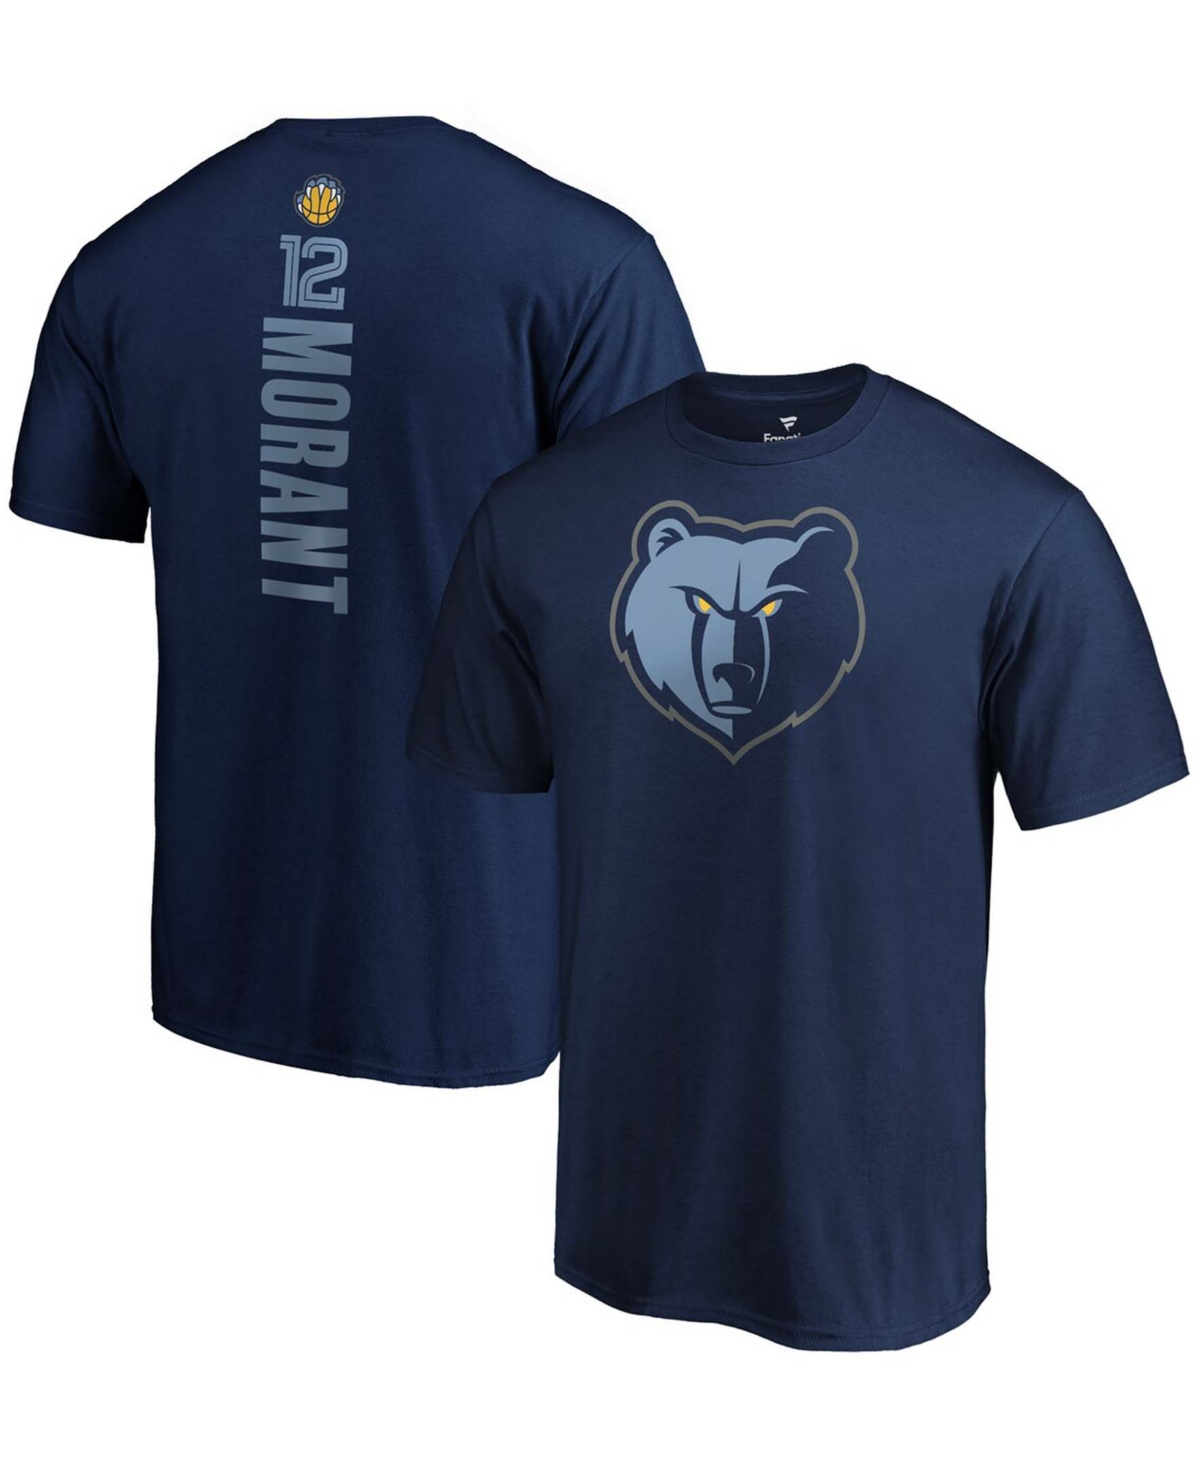 Men's Ja Morant Navy Memphis Grizzlies 2019 Nba Draft Playmaker Name Number T-shirt